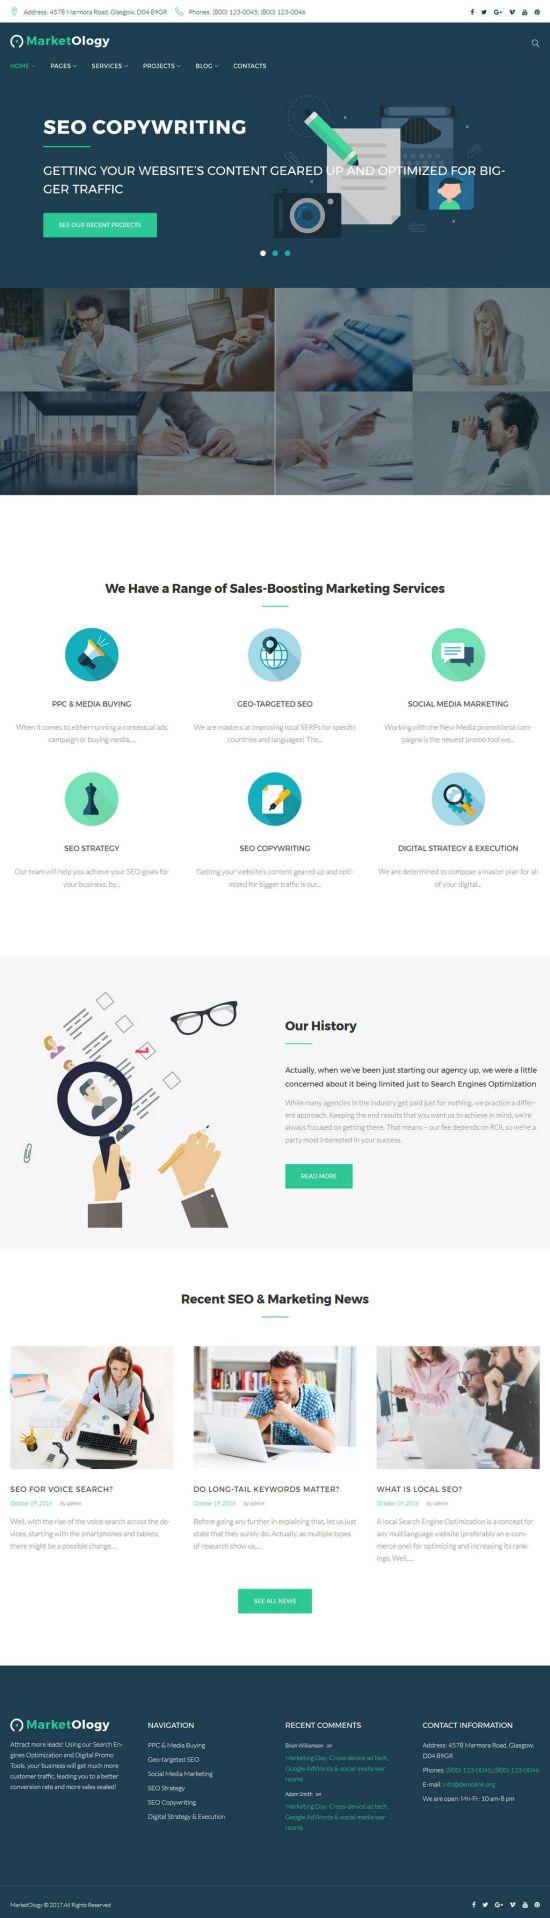 marketology templatemonster–wordpress theme 01 - MarketOlogy WordPress Theme